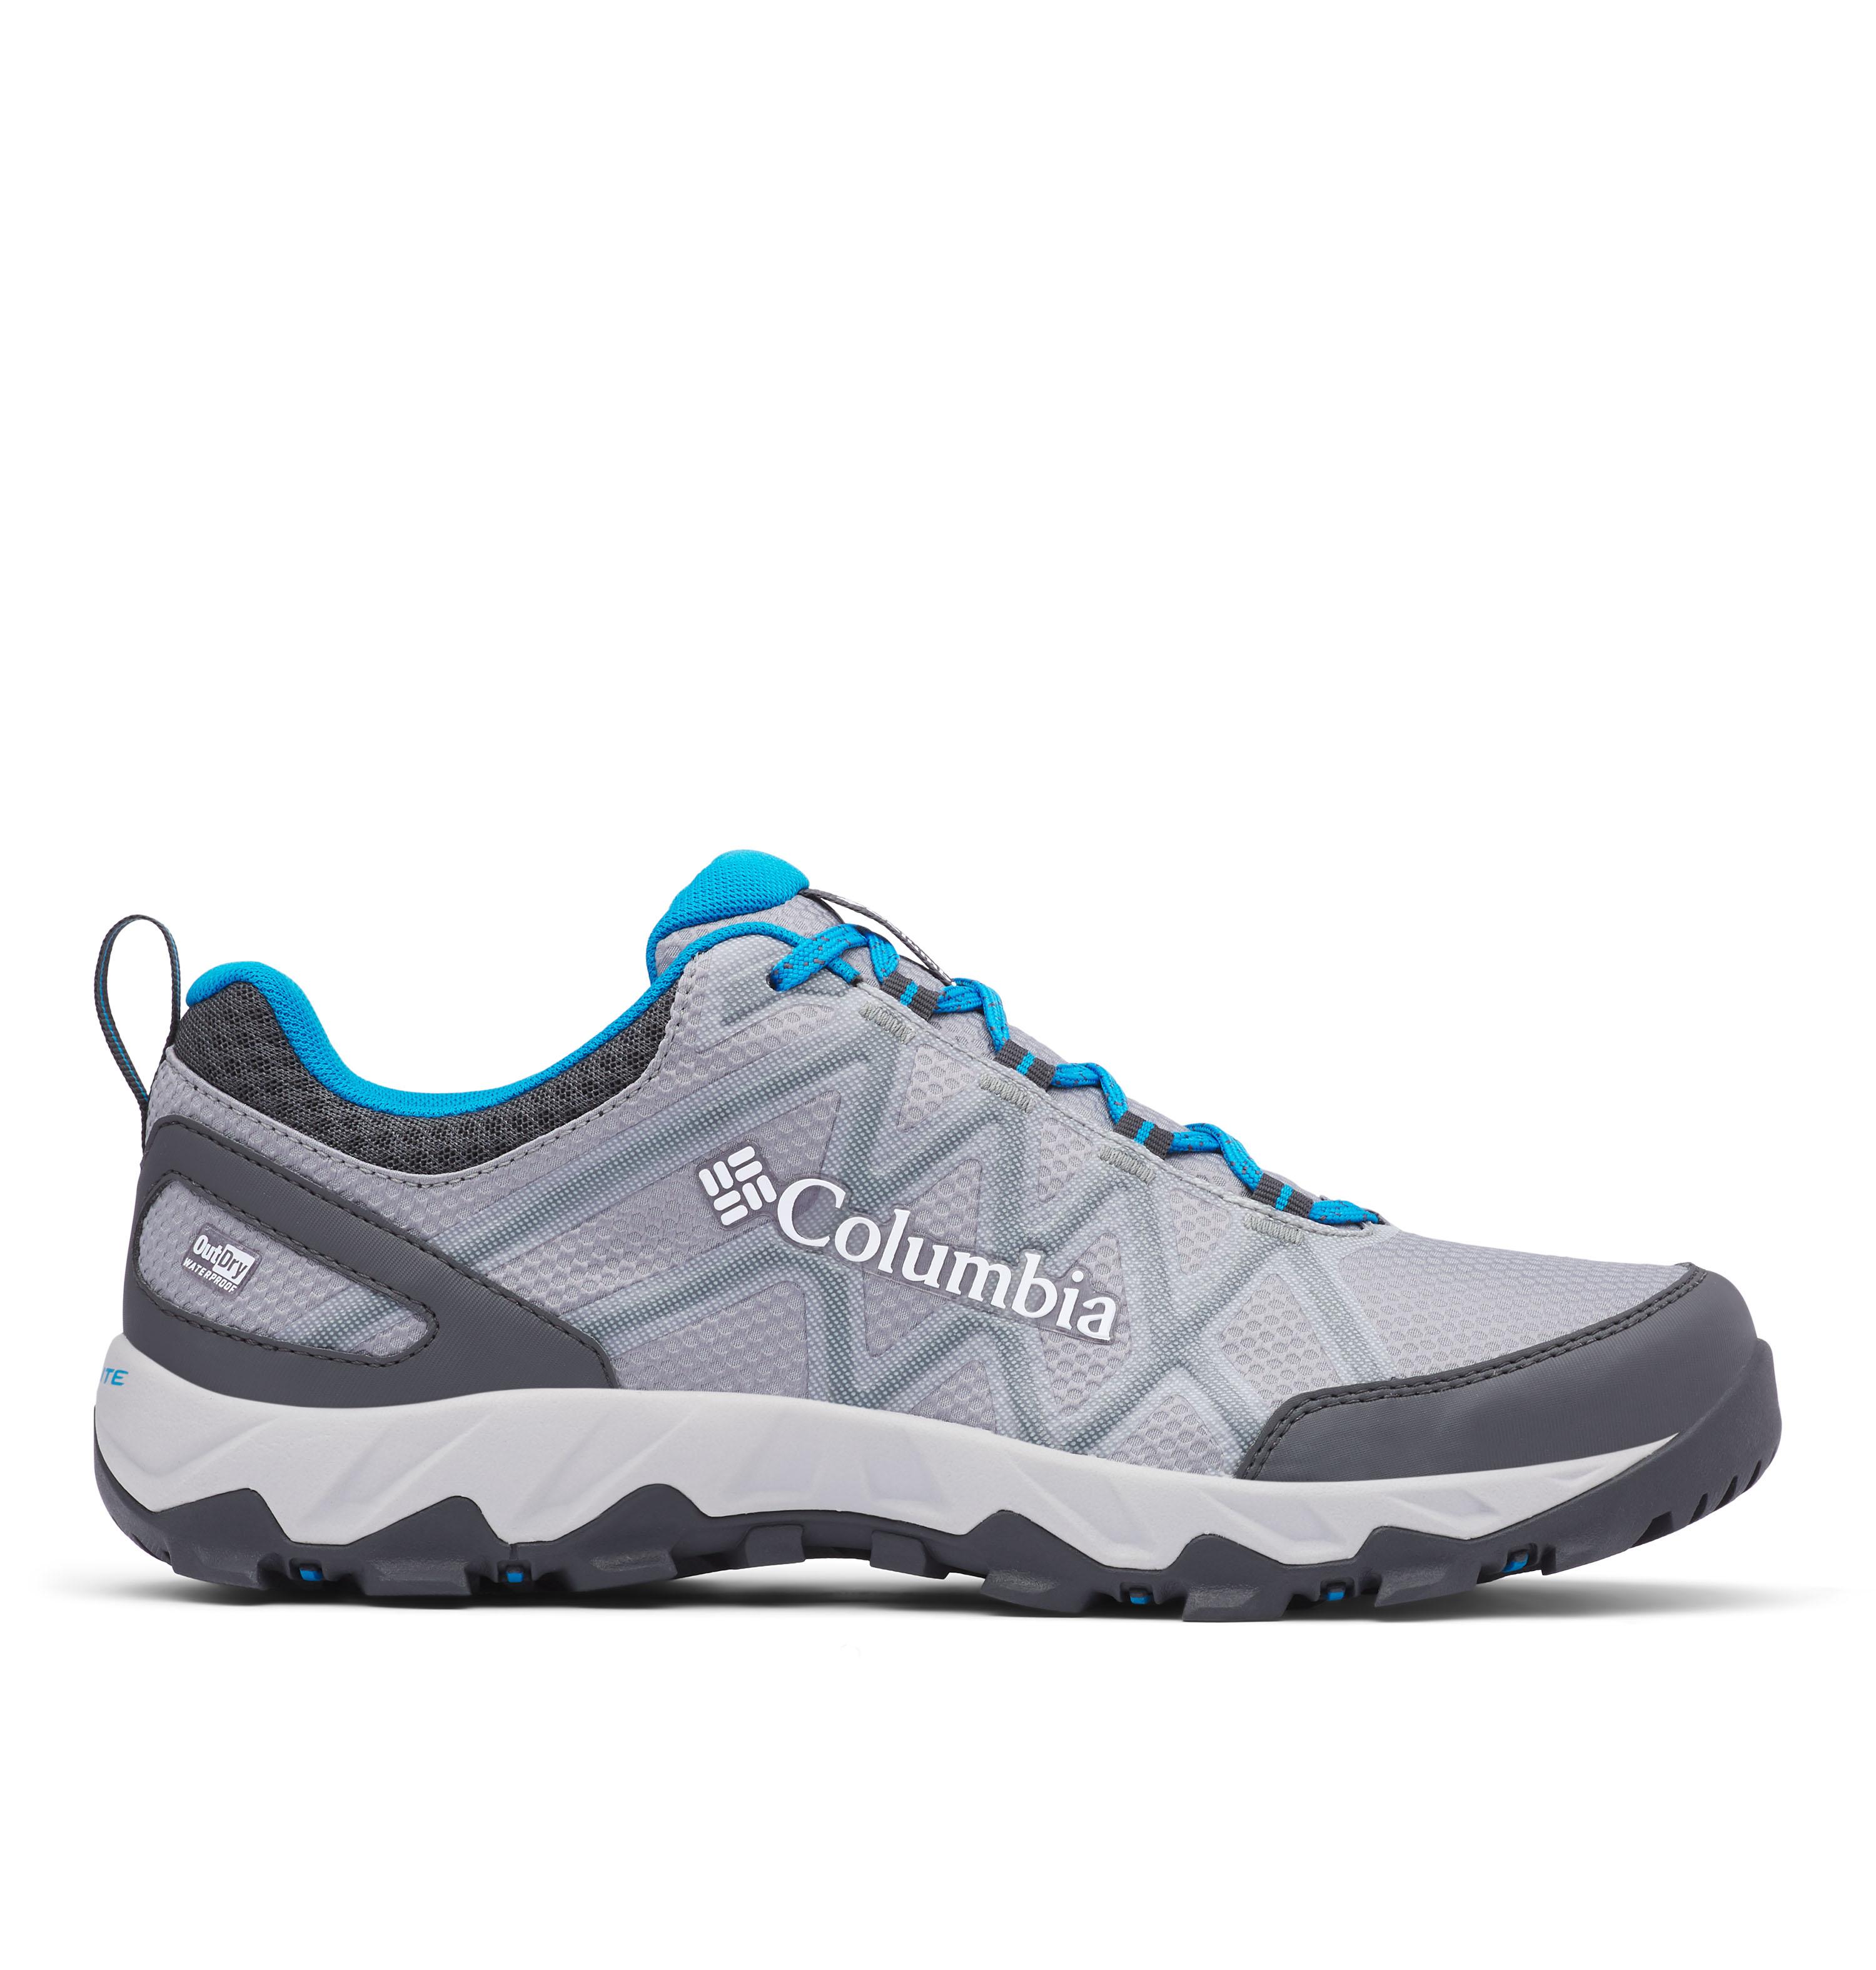 Comprar Columbia Peakfreak X2 Outdry gris / Techlite / Omni-Grip / Chaussures OutDry® /